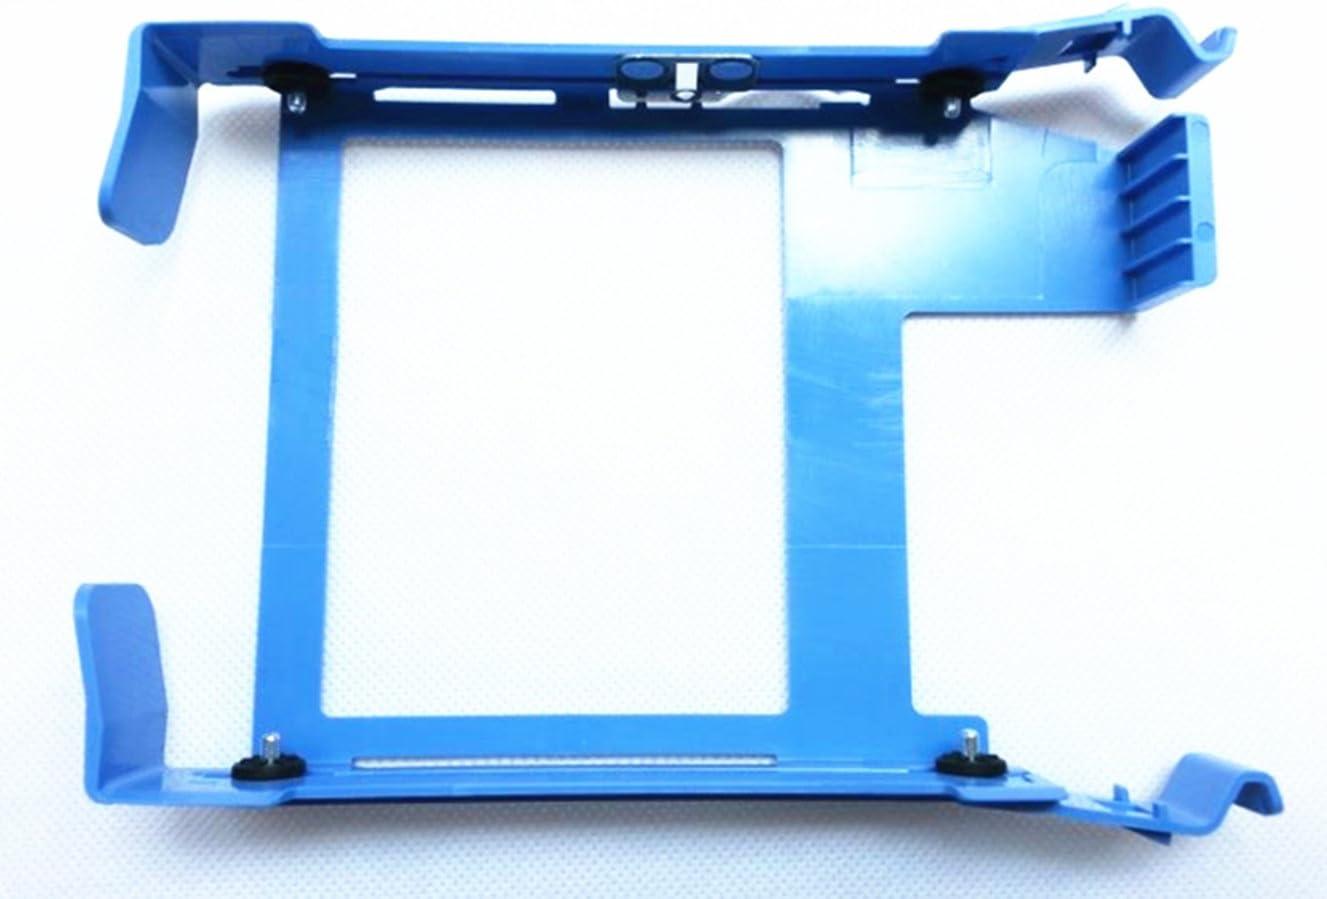 Pocaton 3.5 Inch HDD Hard Drive Caddy/Bracket Applies to Optiplex 390 790 990 3010 3020 7010 7020 9010 9020 MT SFF Computer/Precision workstations Blue